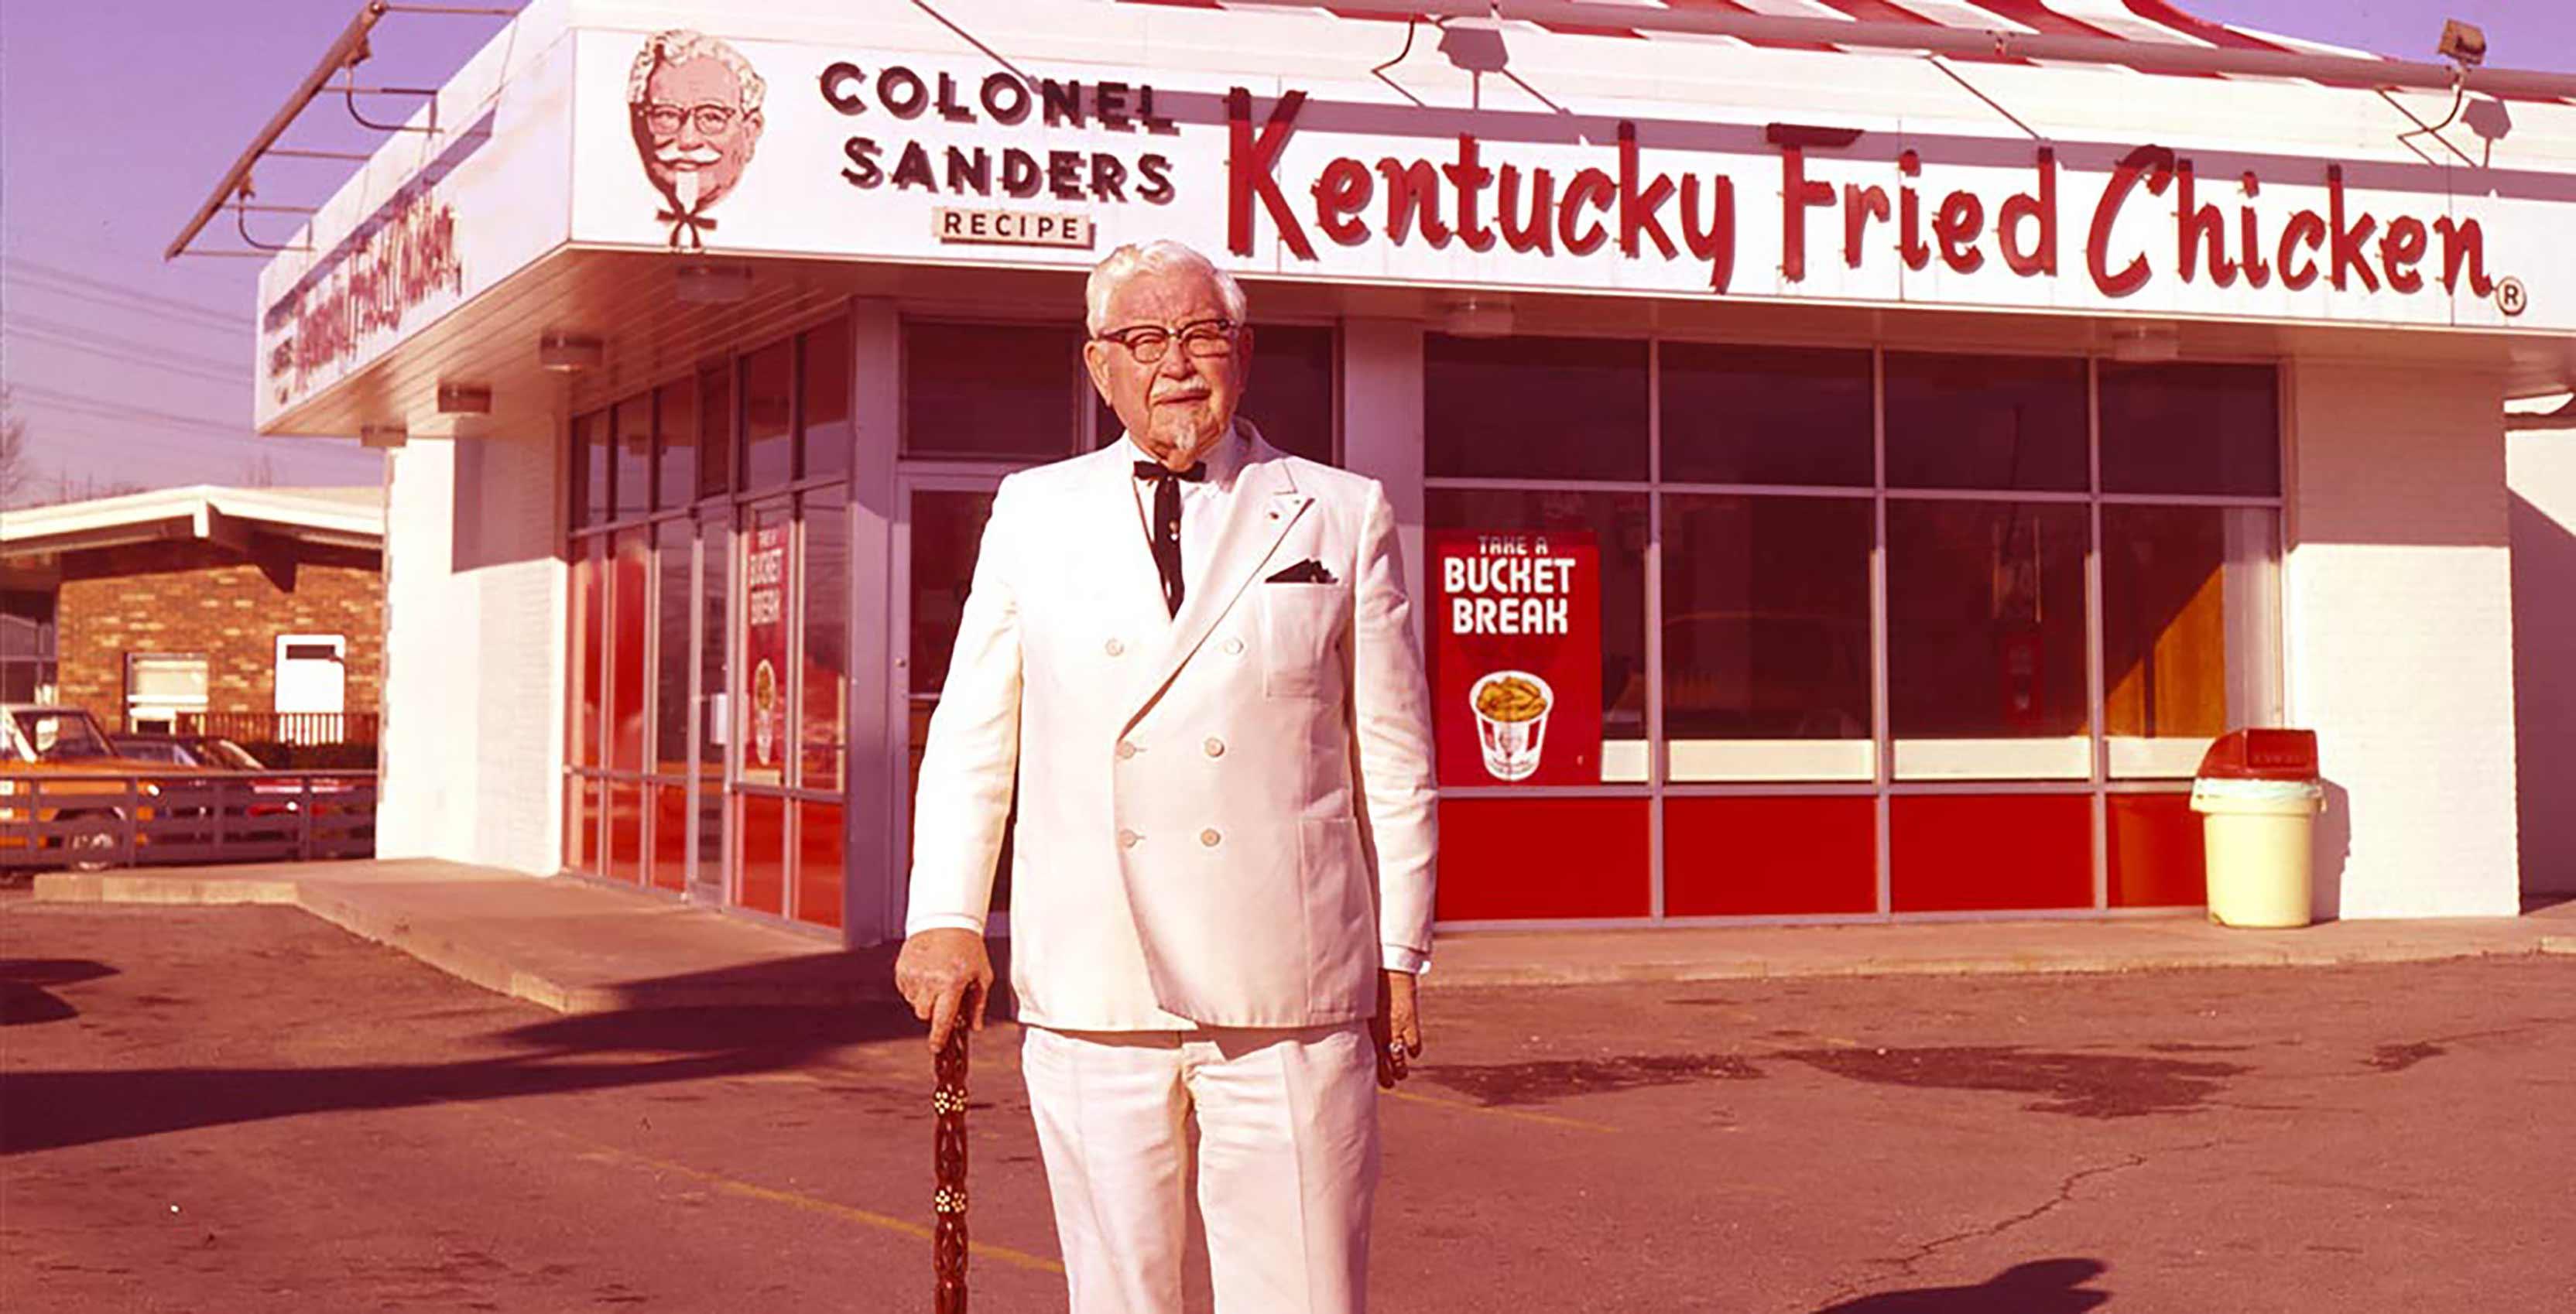 Colonel Sanders at KFC